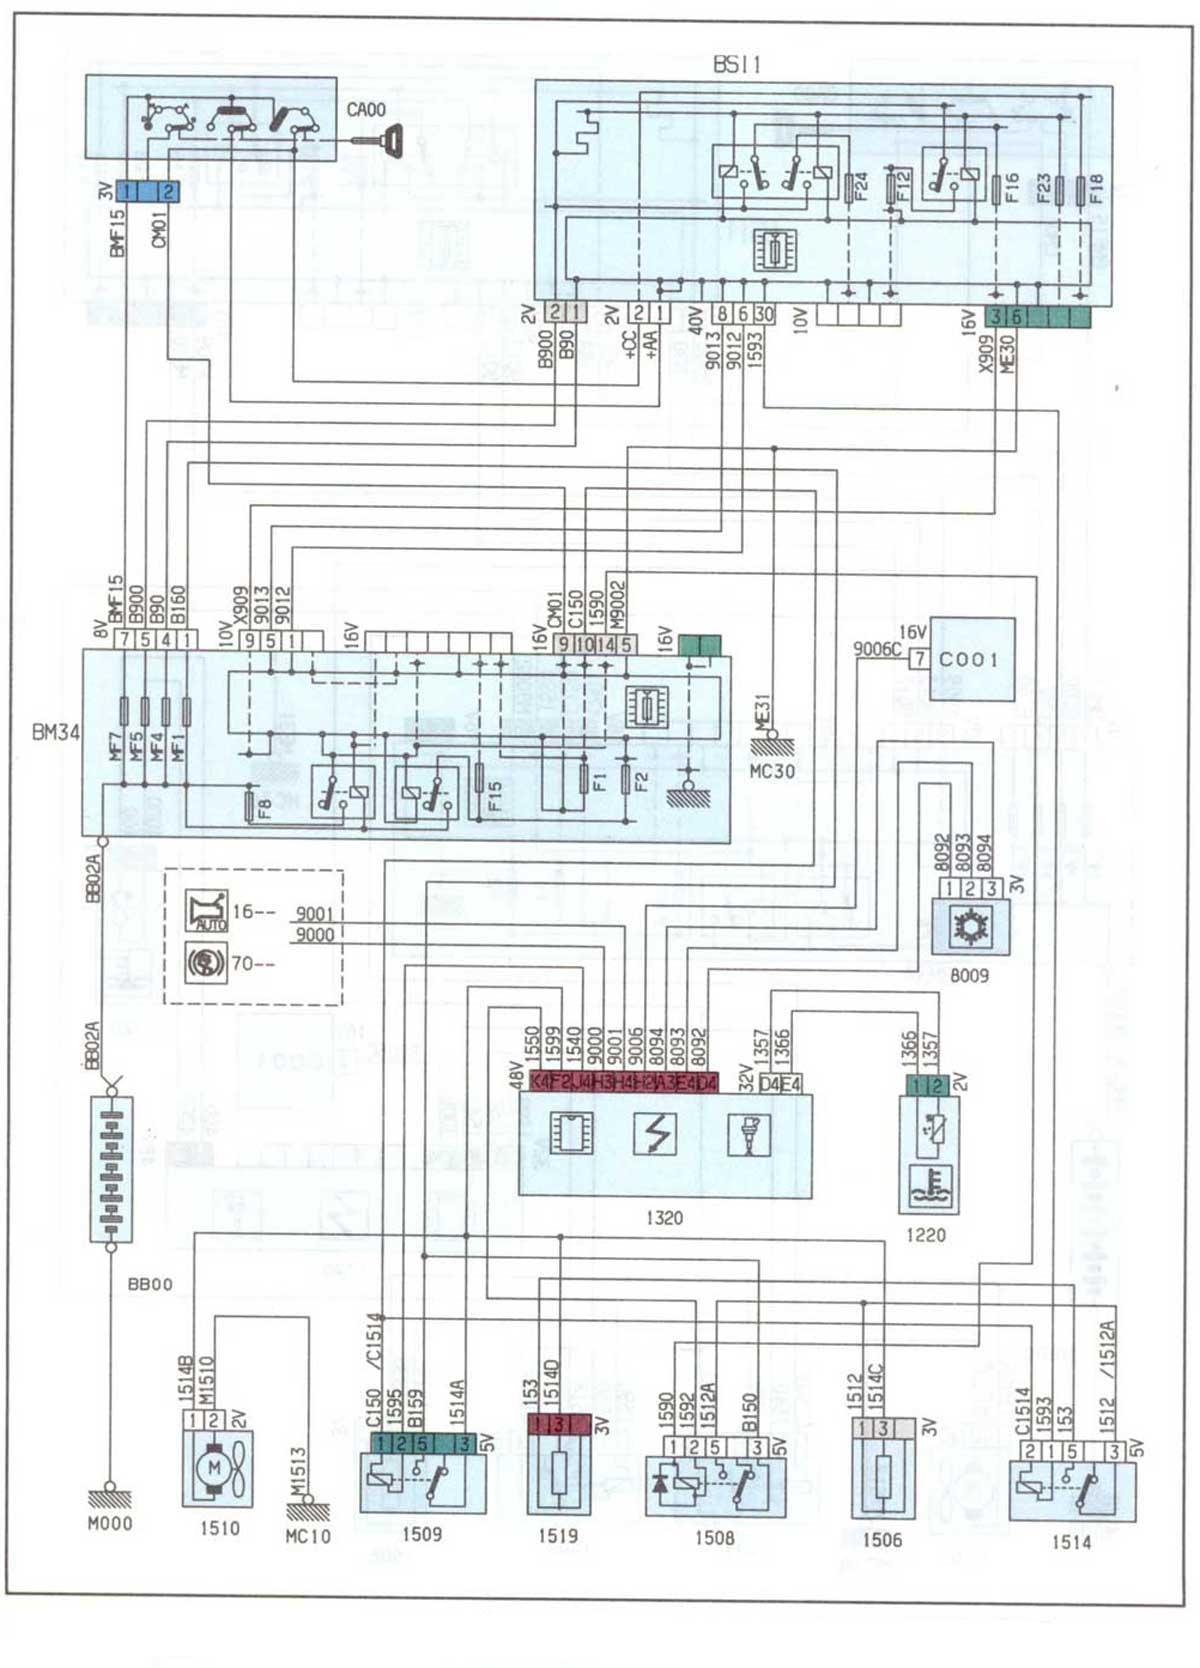 Кондиционер ситроен схема